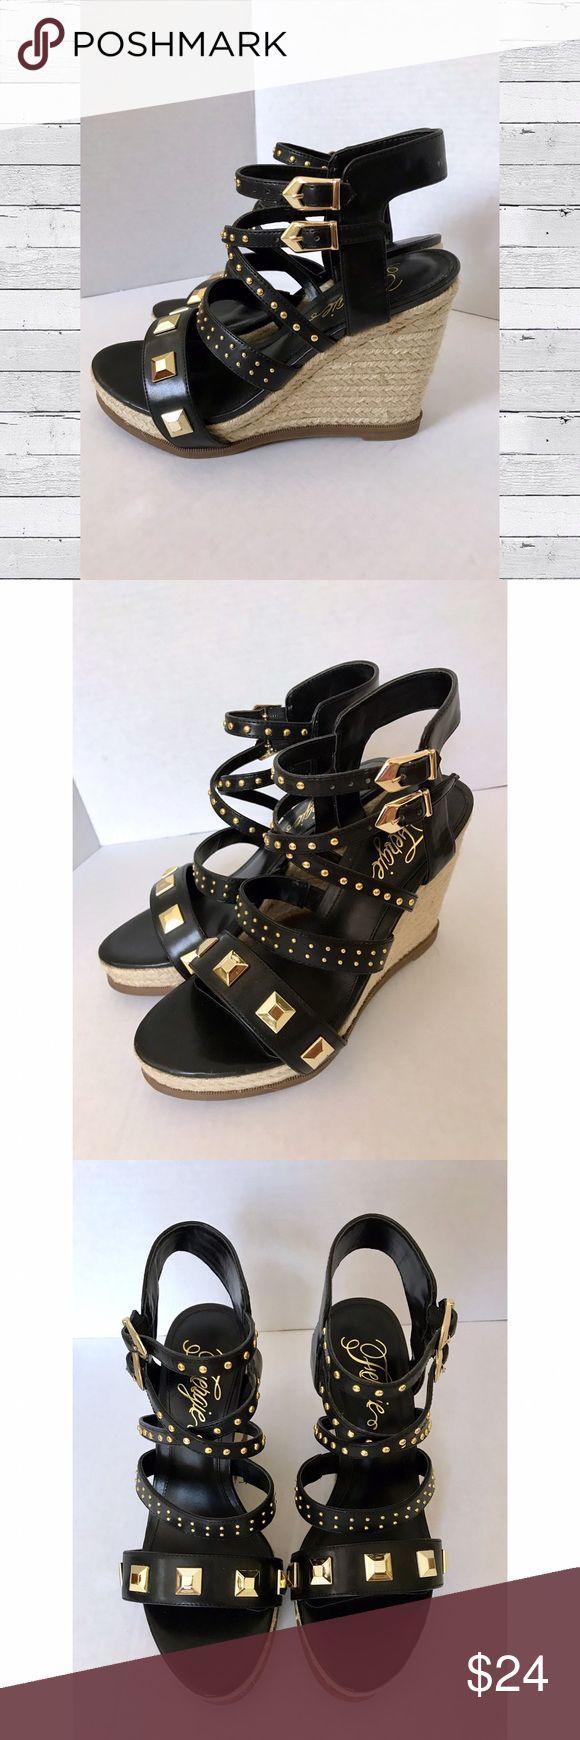 "Black Studded Espadrille Wedge Sandals New with box - Black strappy, gold studded, espadrille wedge sandals - 4"" heel - Brand: Fergie Fergie Shoes Espadrilles"